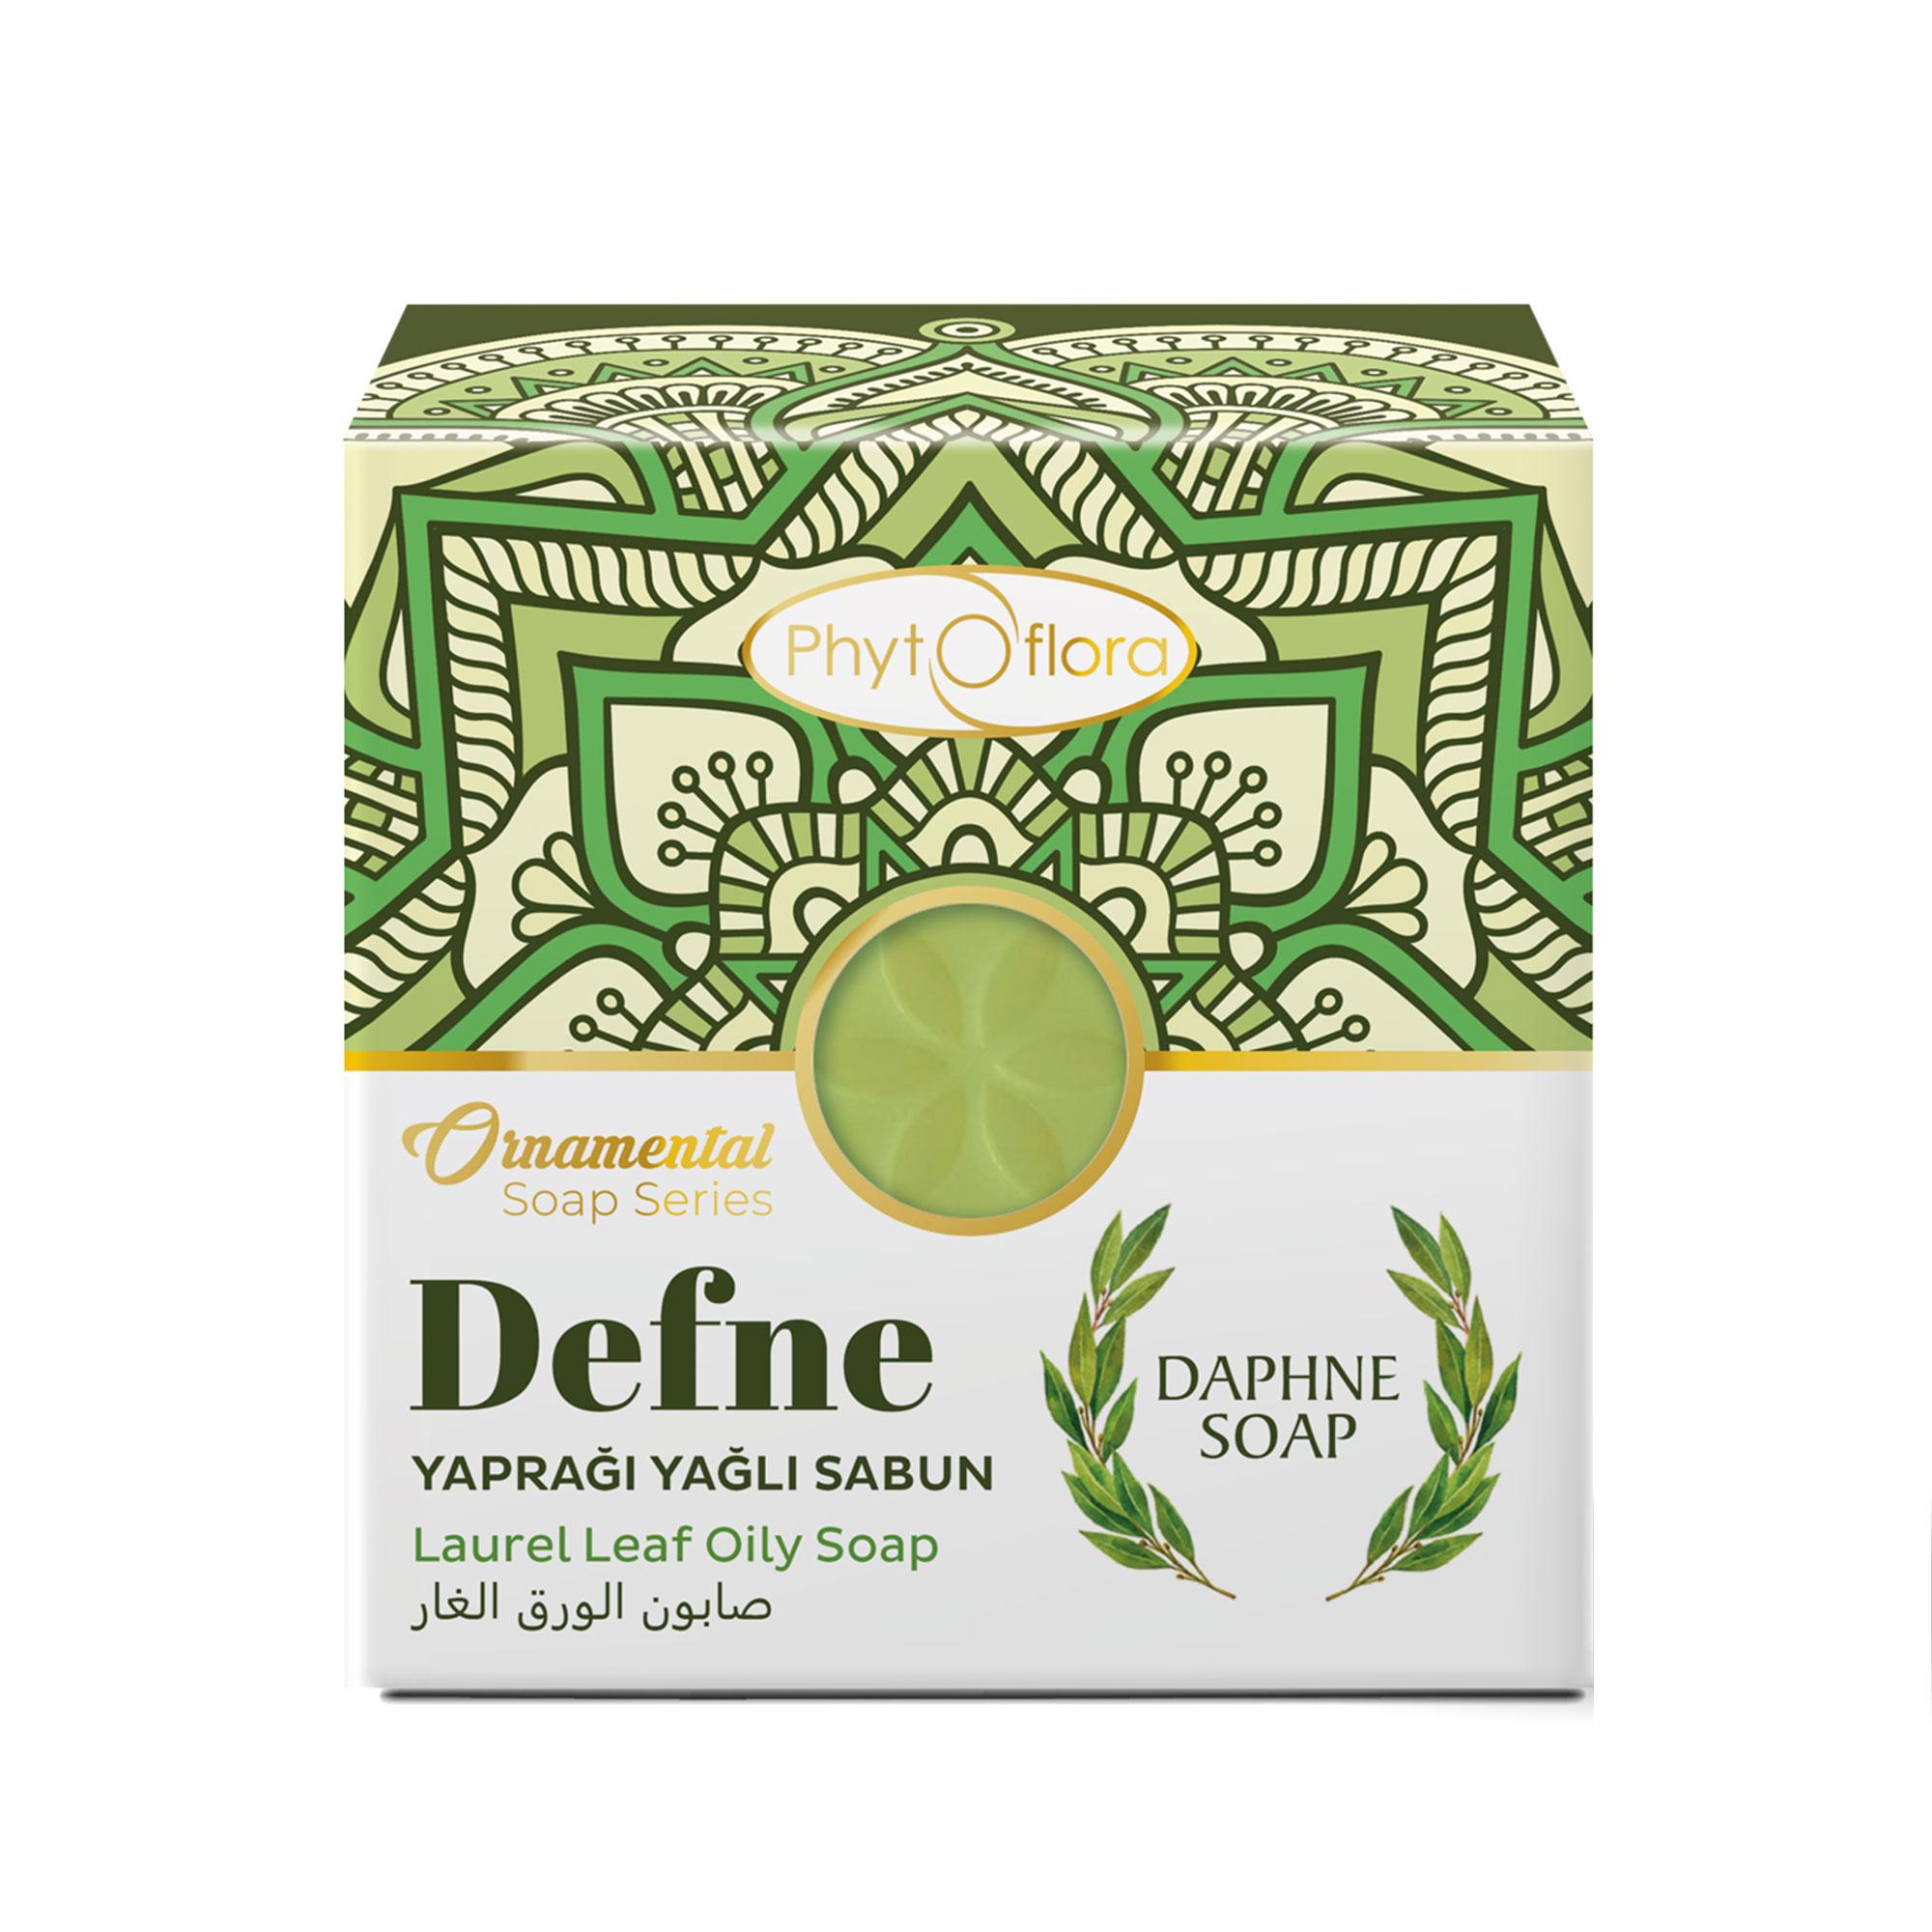 laurel leaf herbal soap - ornamental soap series